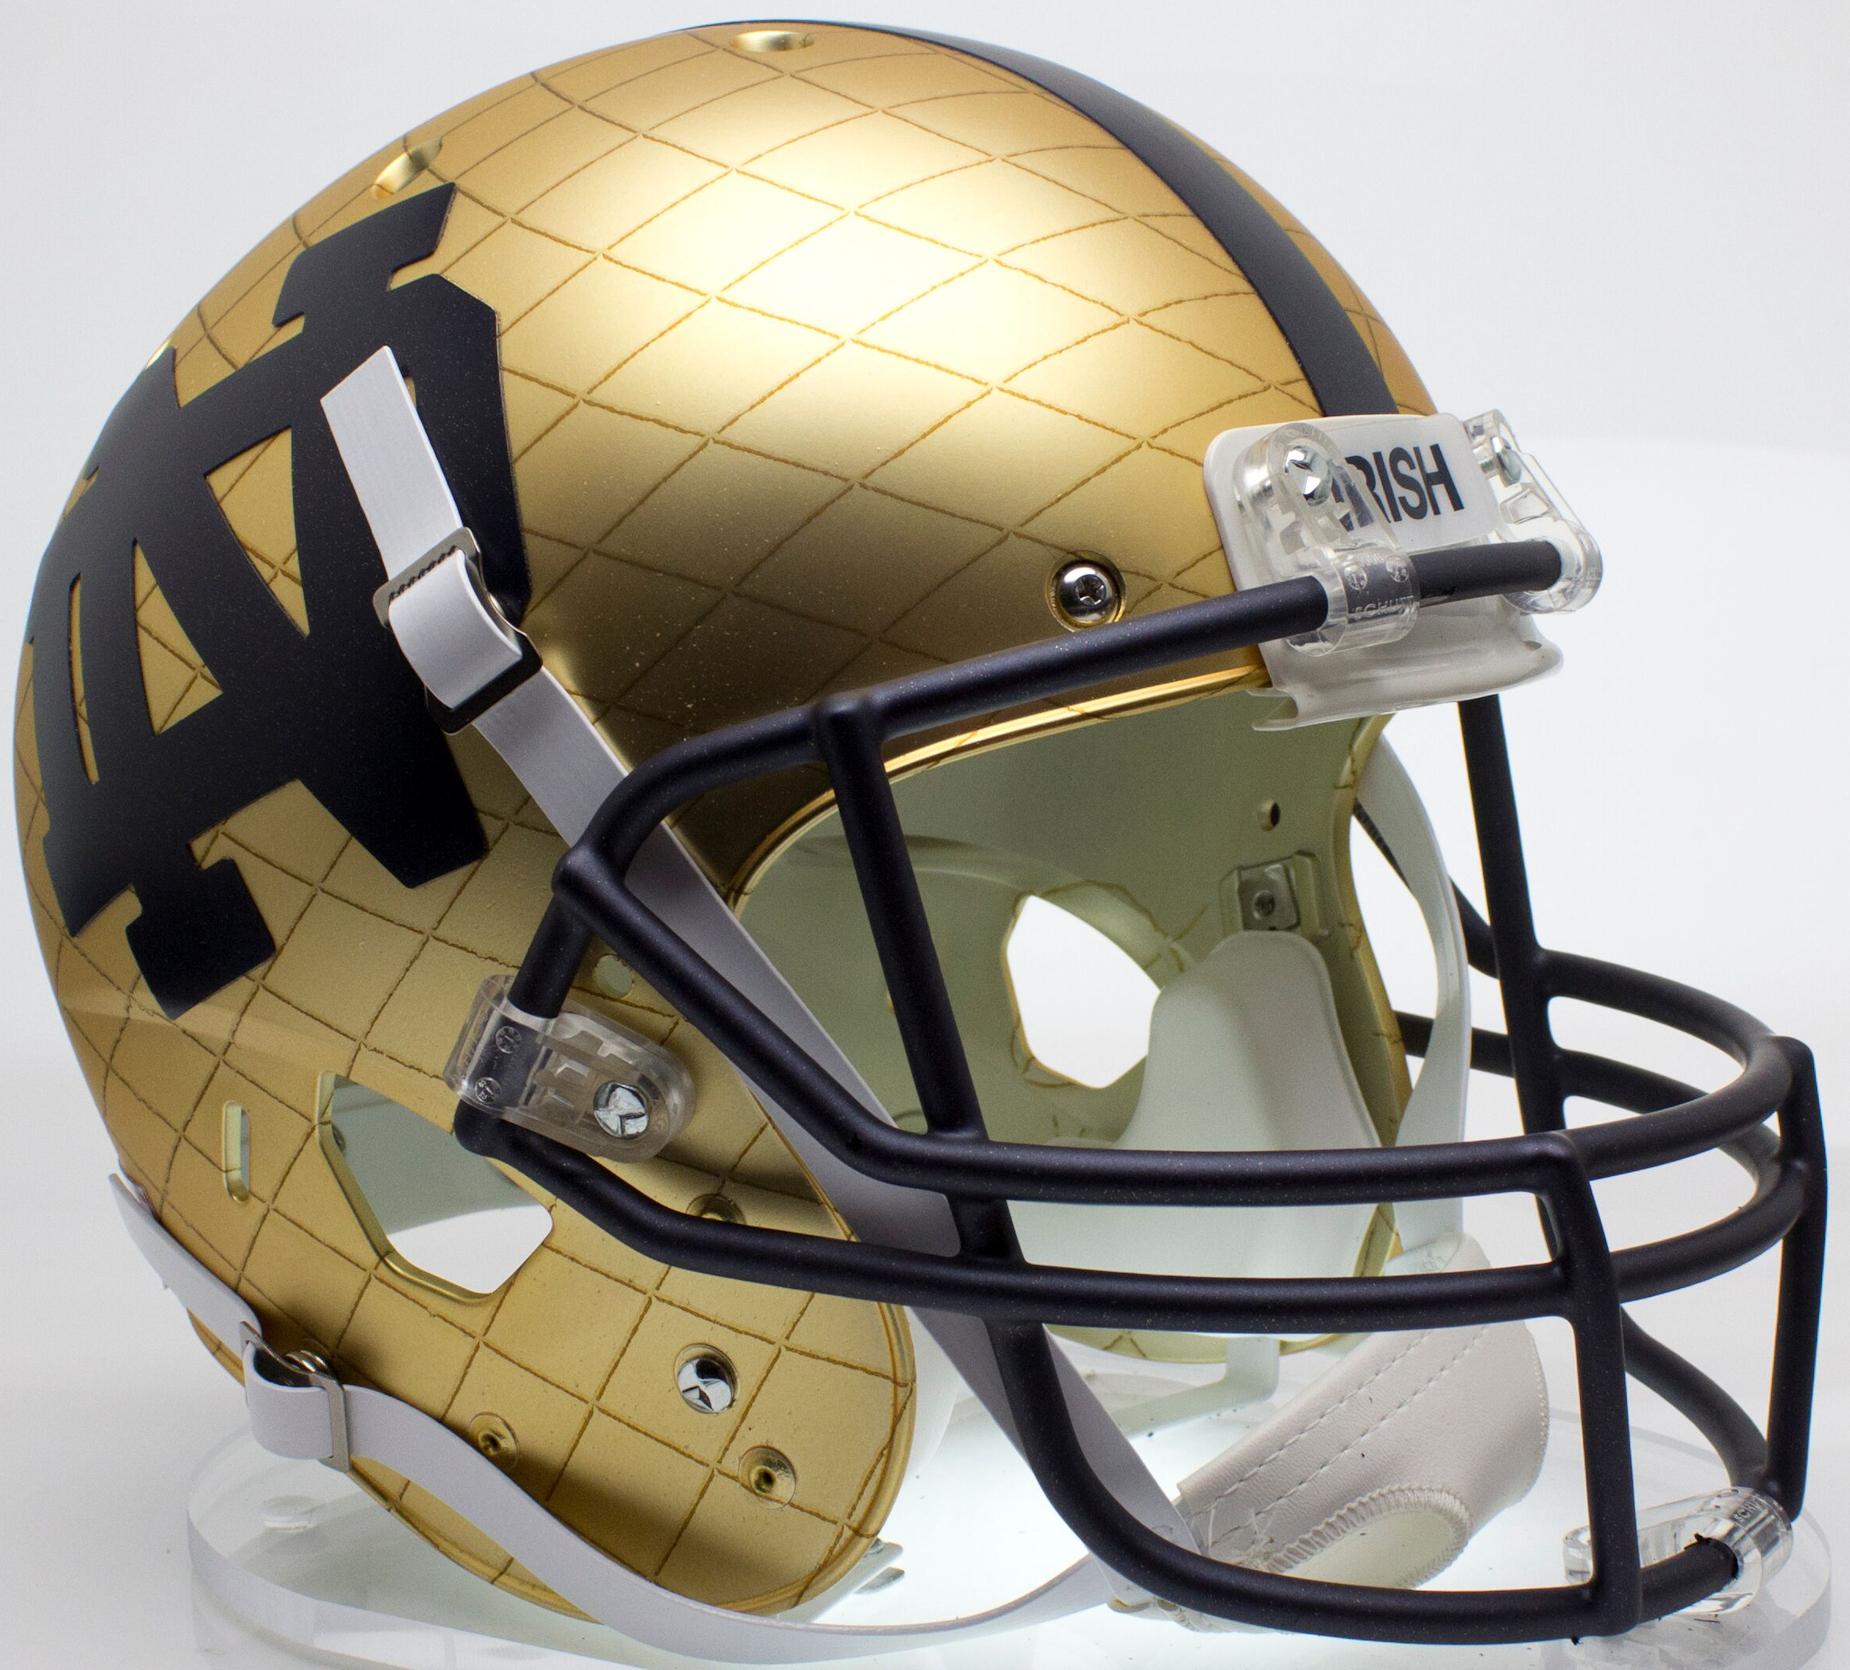 Notre Dame Fighting Irish Full XP Replica Football Helmet Schutt <B>2014 HydroSkin Indianapolis</B>